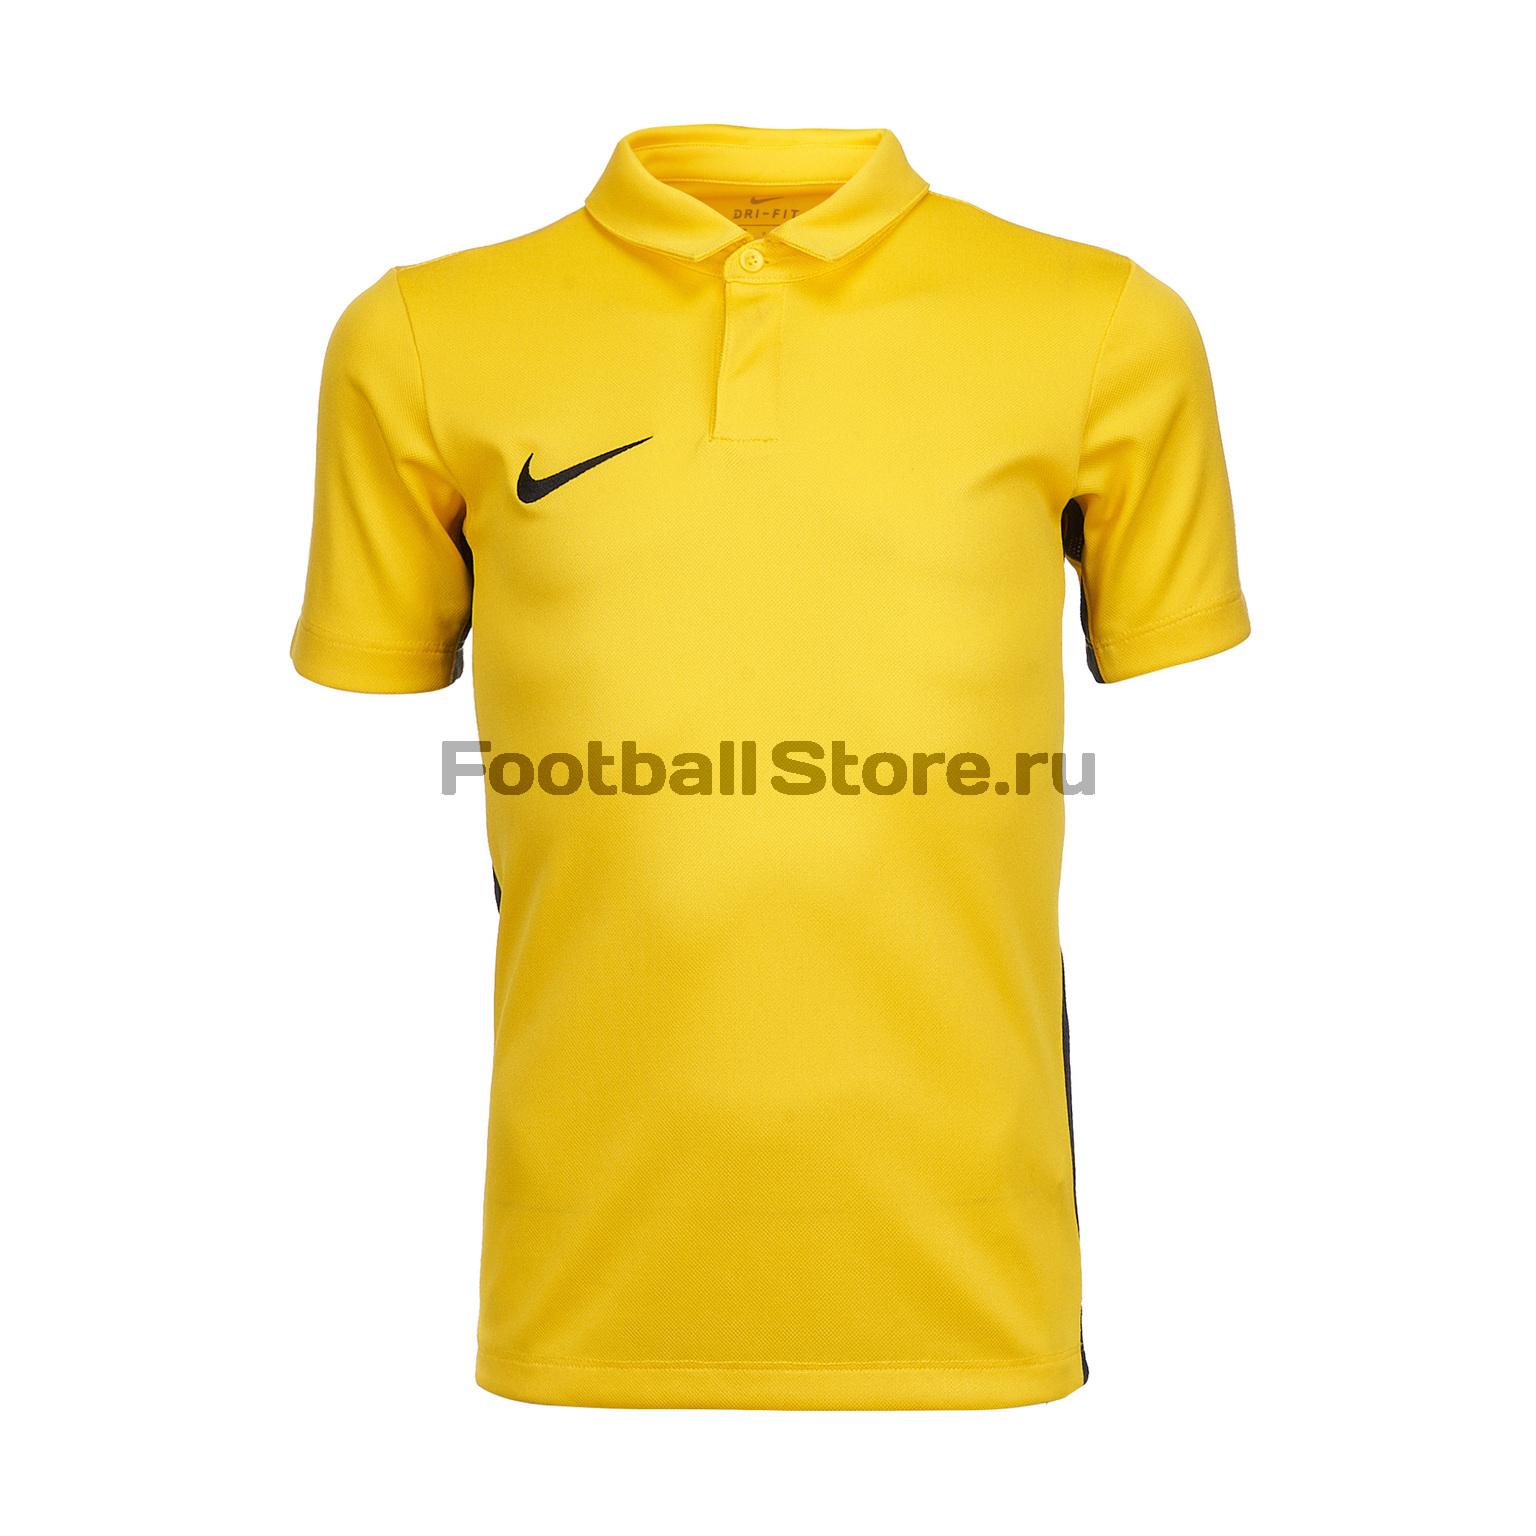 Поло подростковое Nike Dry Academy Polo 899991-719 цена